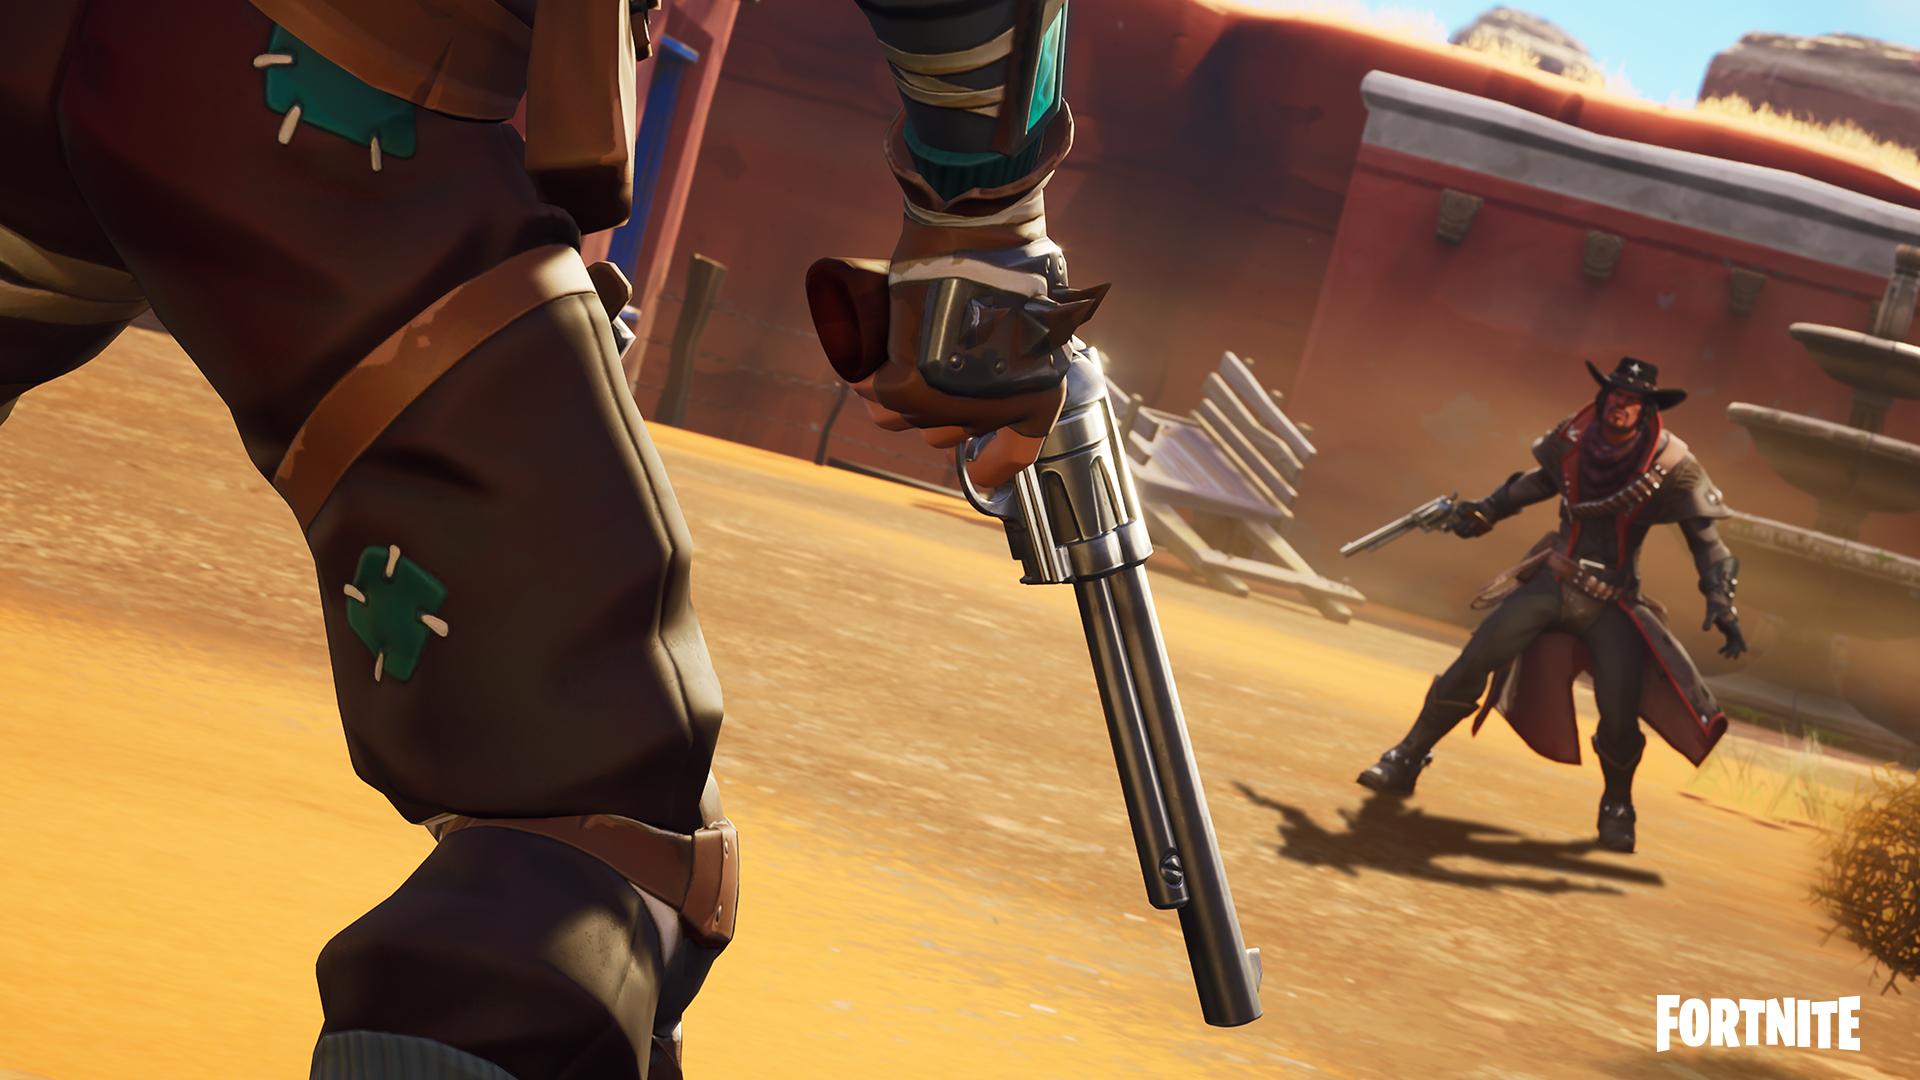 Fortnite LTM Loading Screen - Wild West